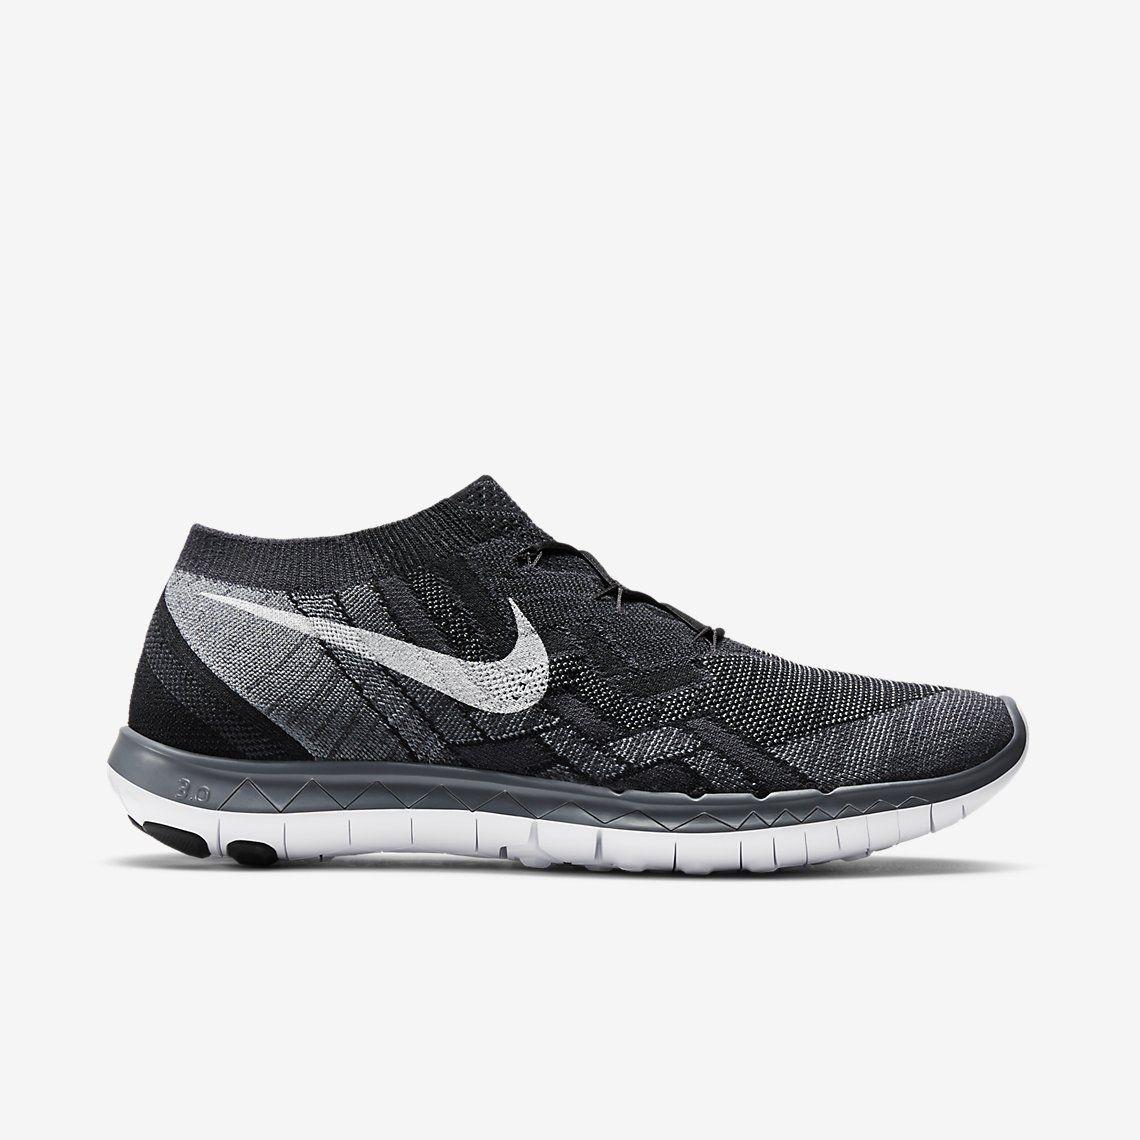 premium selection d0bc5 6d385 Nike Free 3.0 Flyknit Men s Running Shoe. Nike Store DK